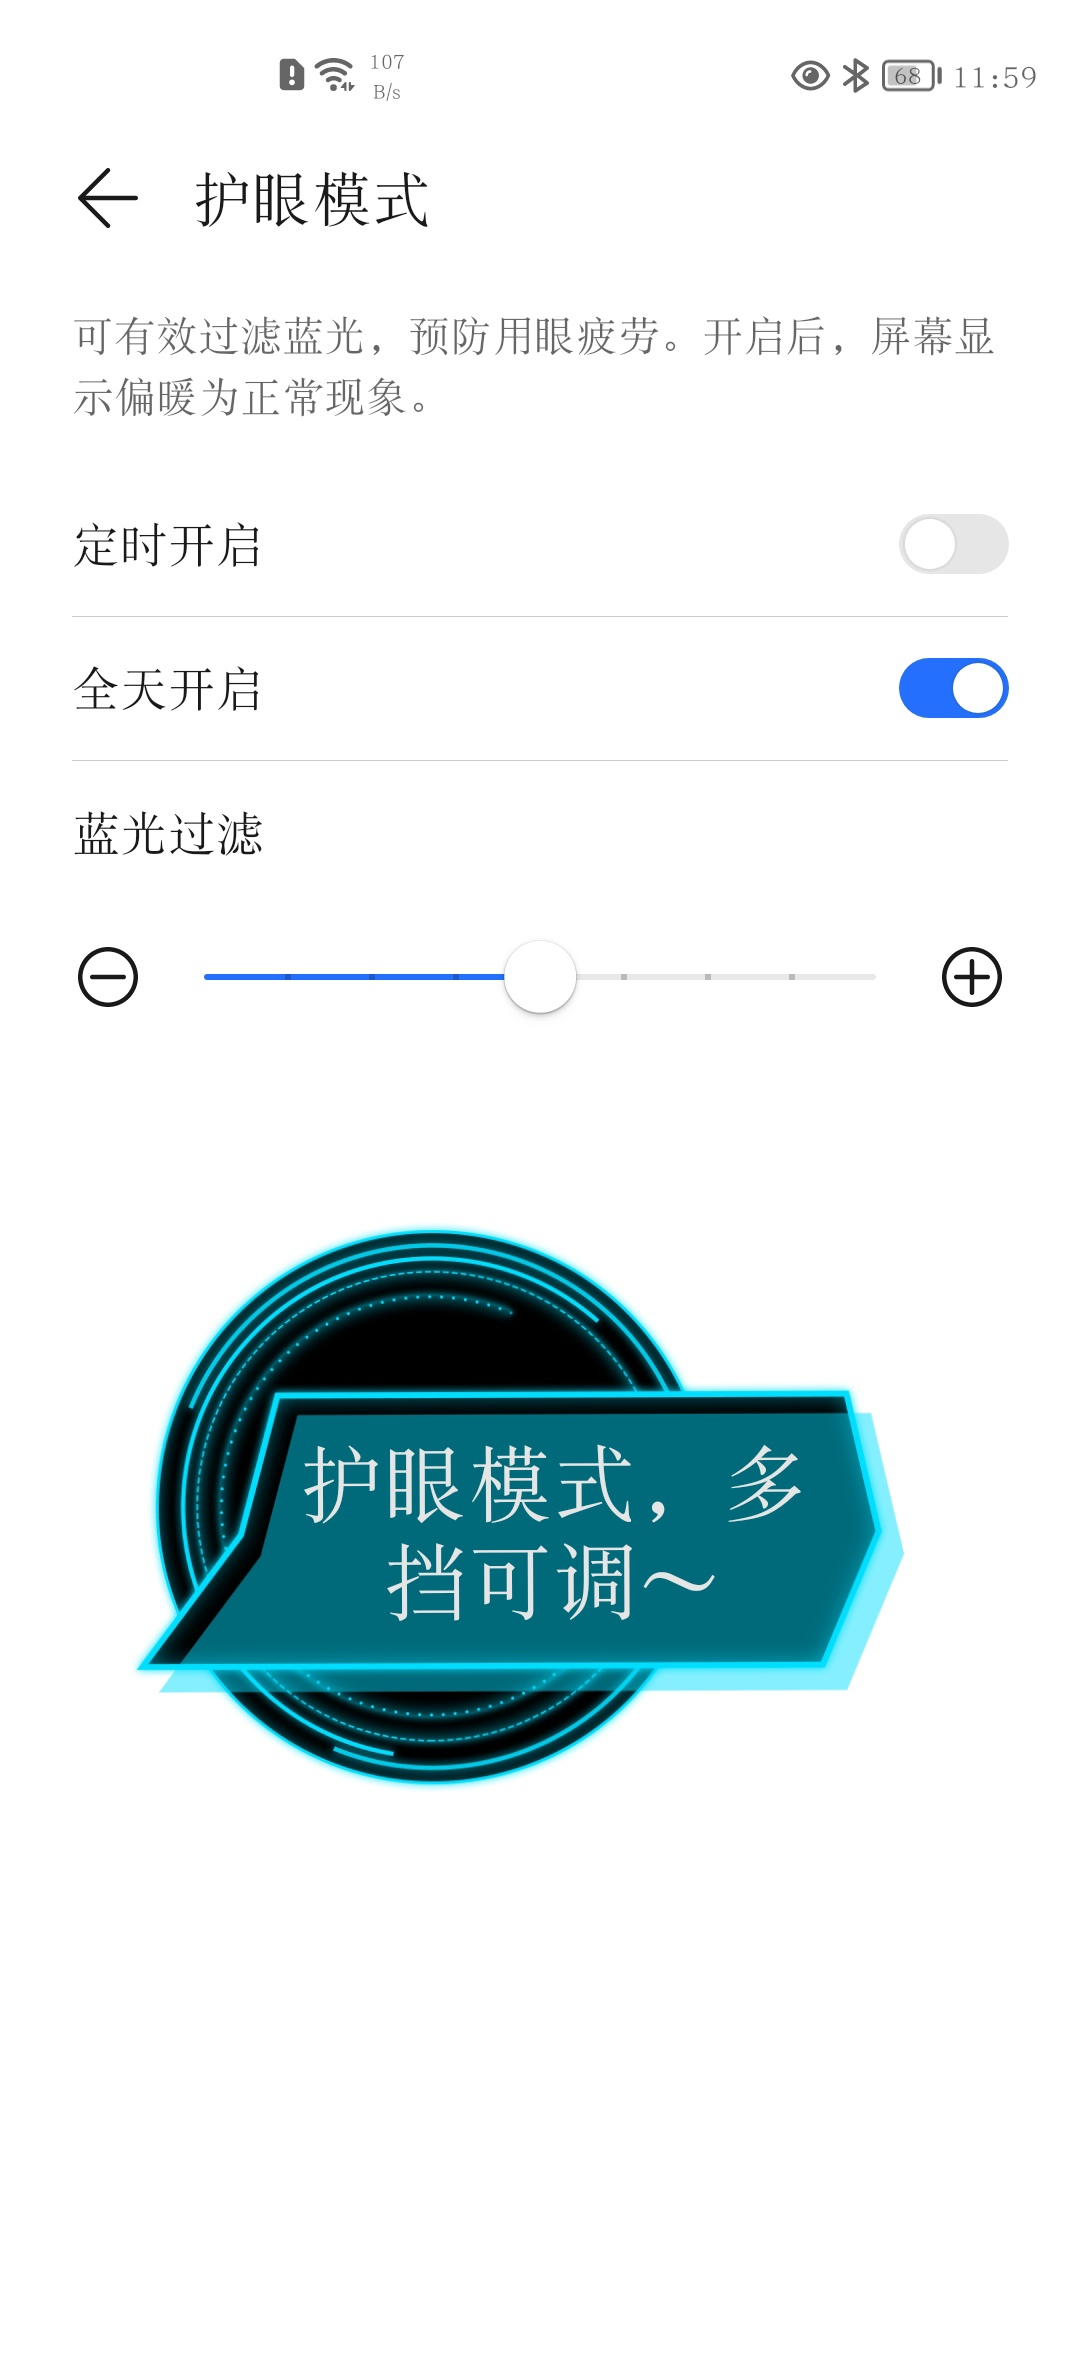 Screenshot_20210923_115915_edit_279474584264118.jpg